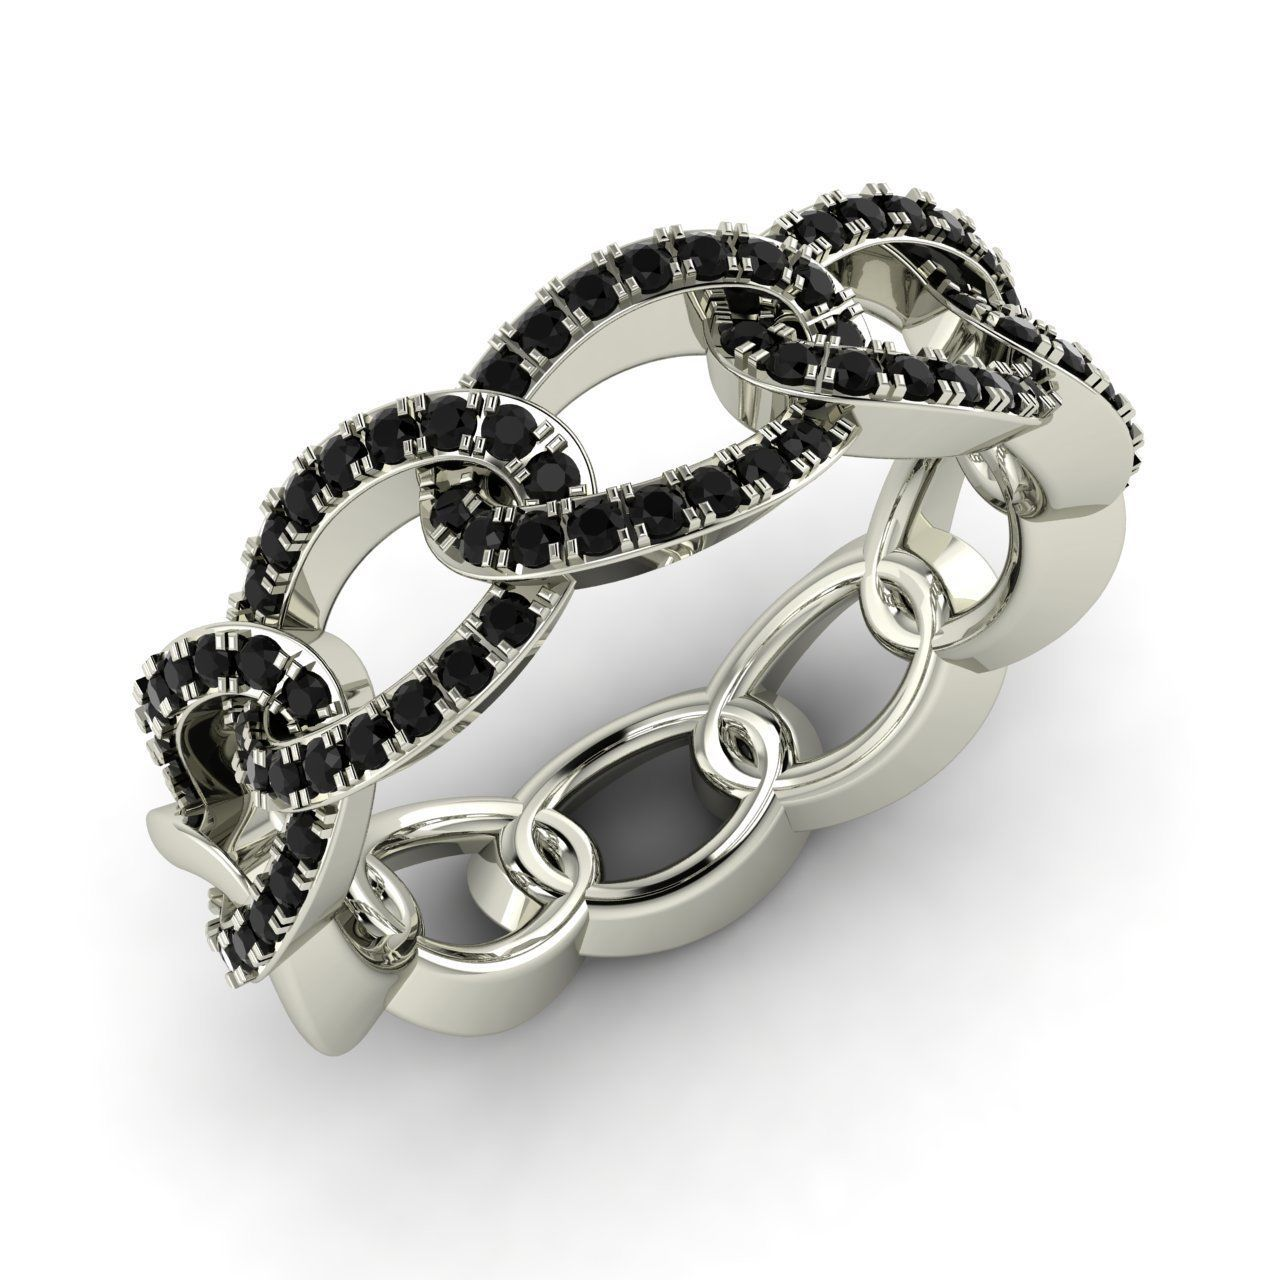 0 40 Ct Round Black Diamonds Solid 18K White Gold Wedding